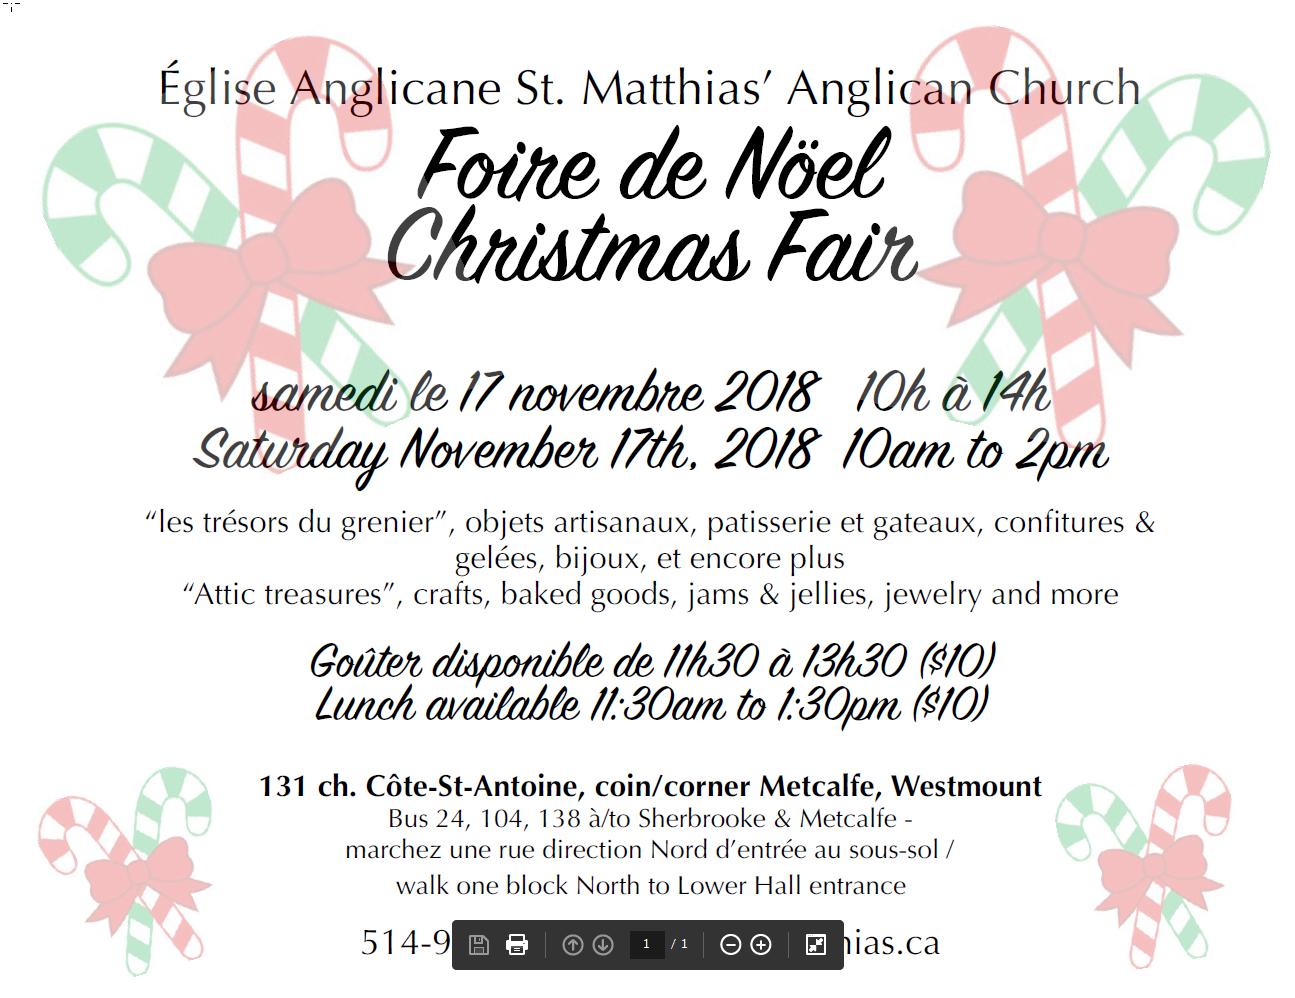 2018-11-09 13_47_30-2018 Christmas Fair.pdf - Adobe Acrobat Reader DC.png